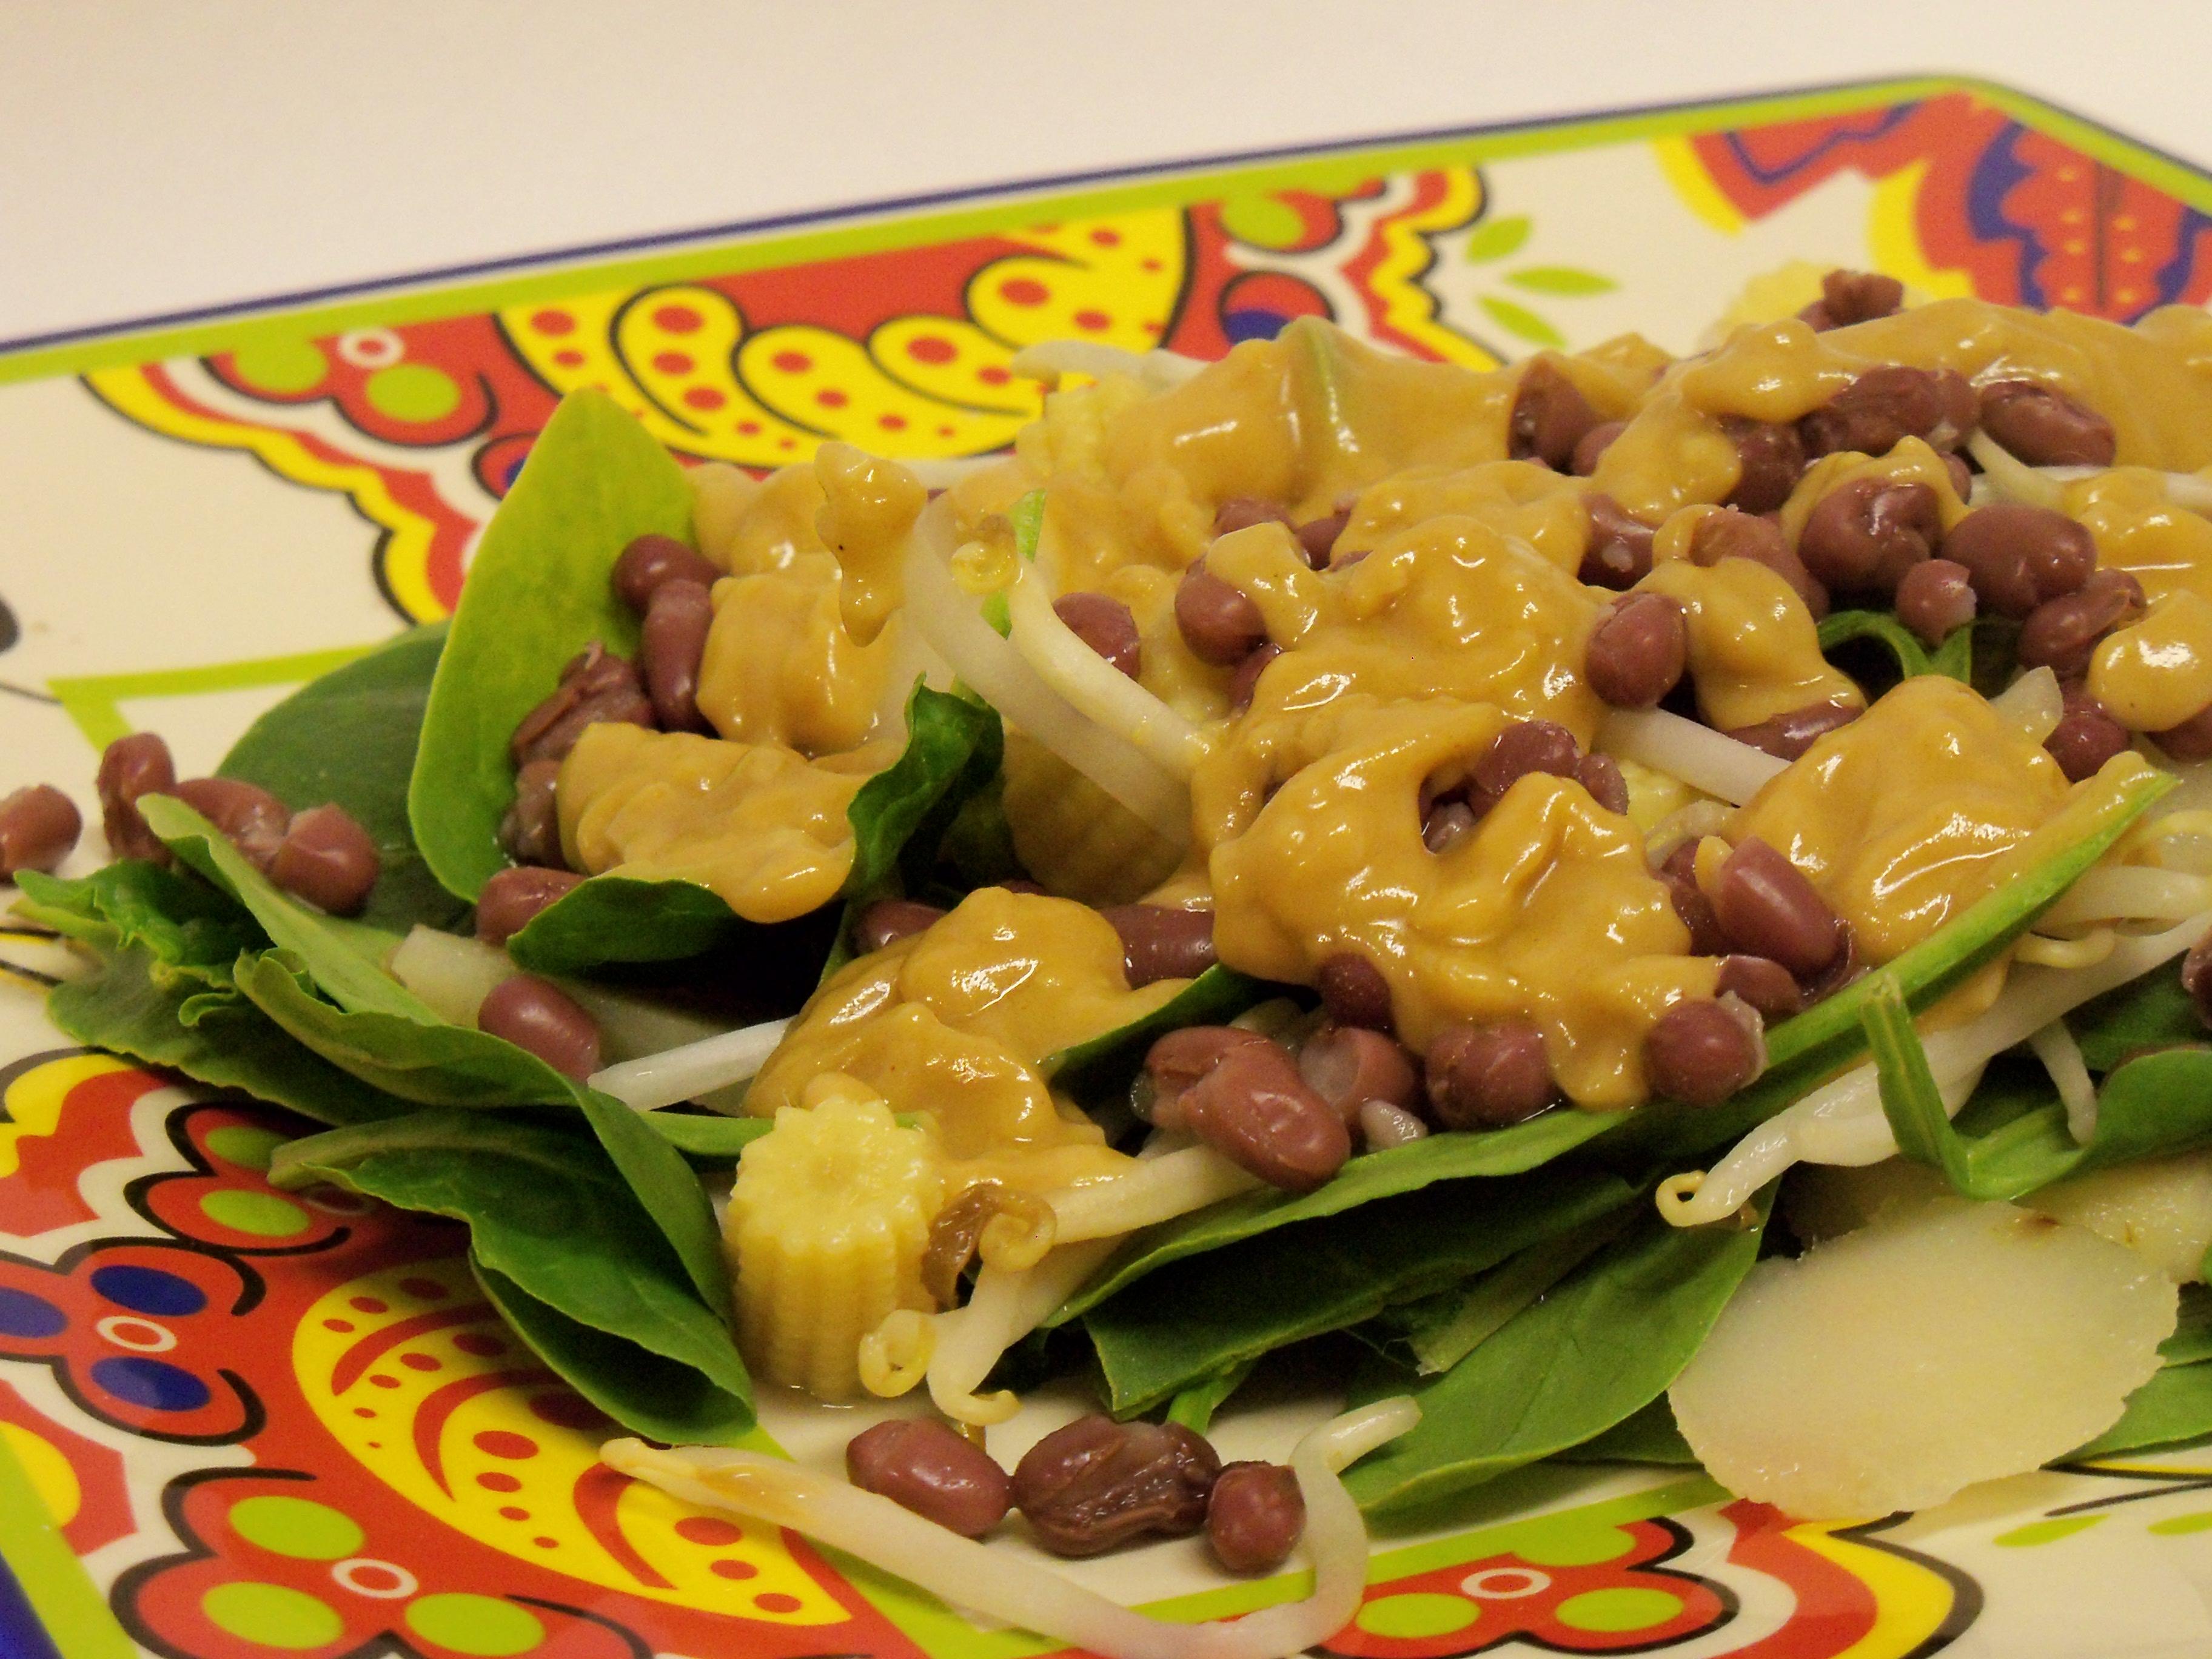 Adzuki Bean Salad with Peanut Butter Dressing